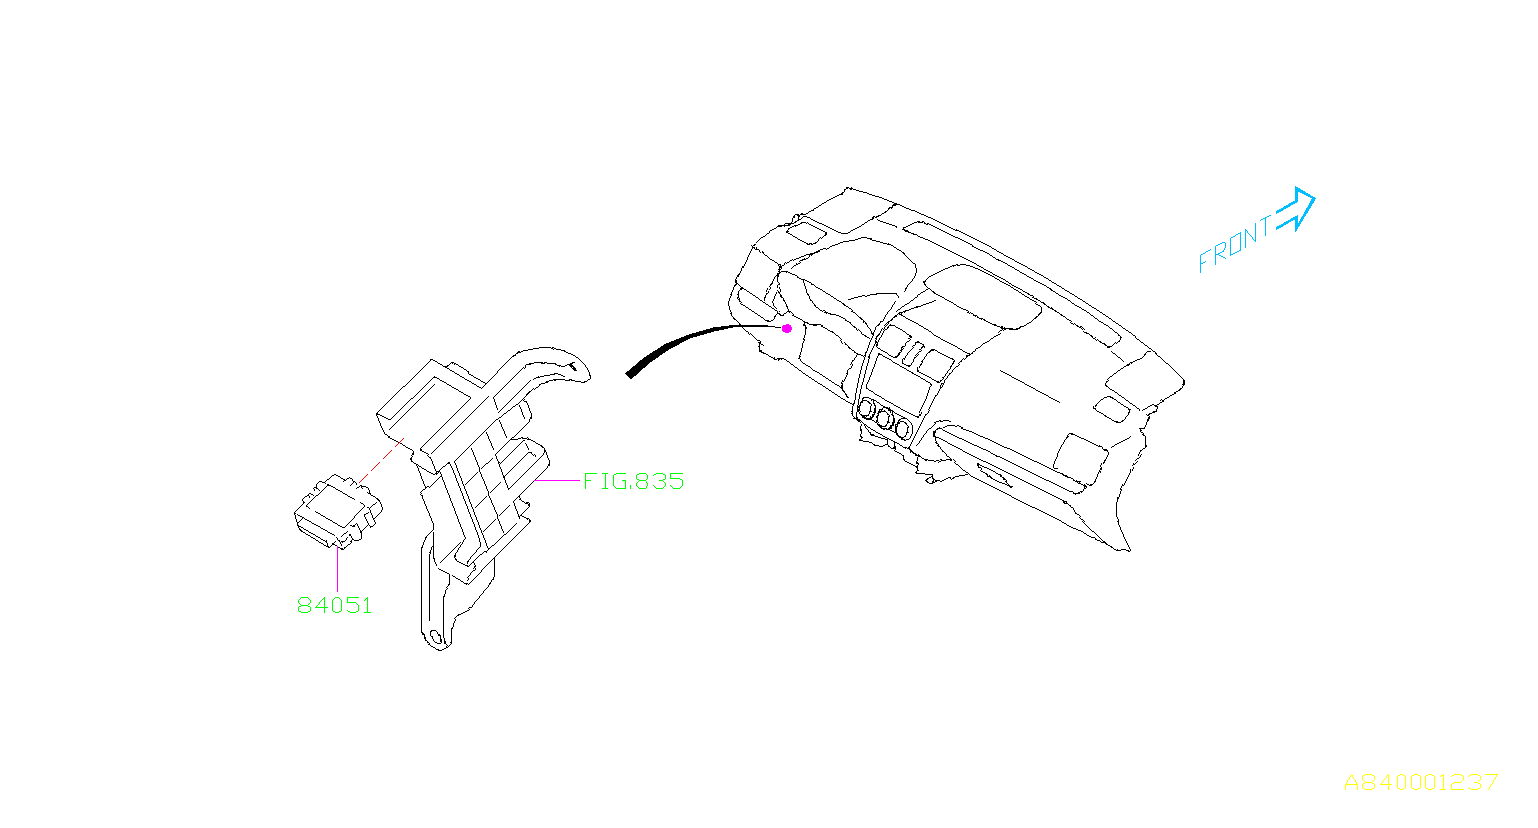 Fj020